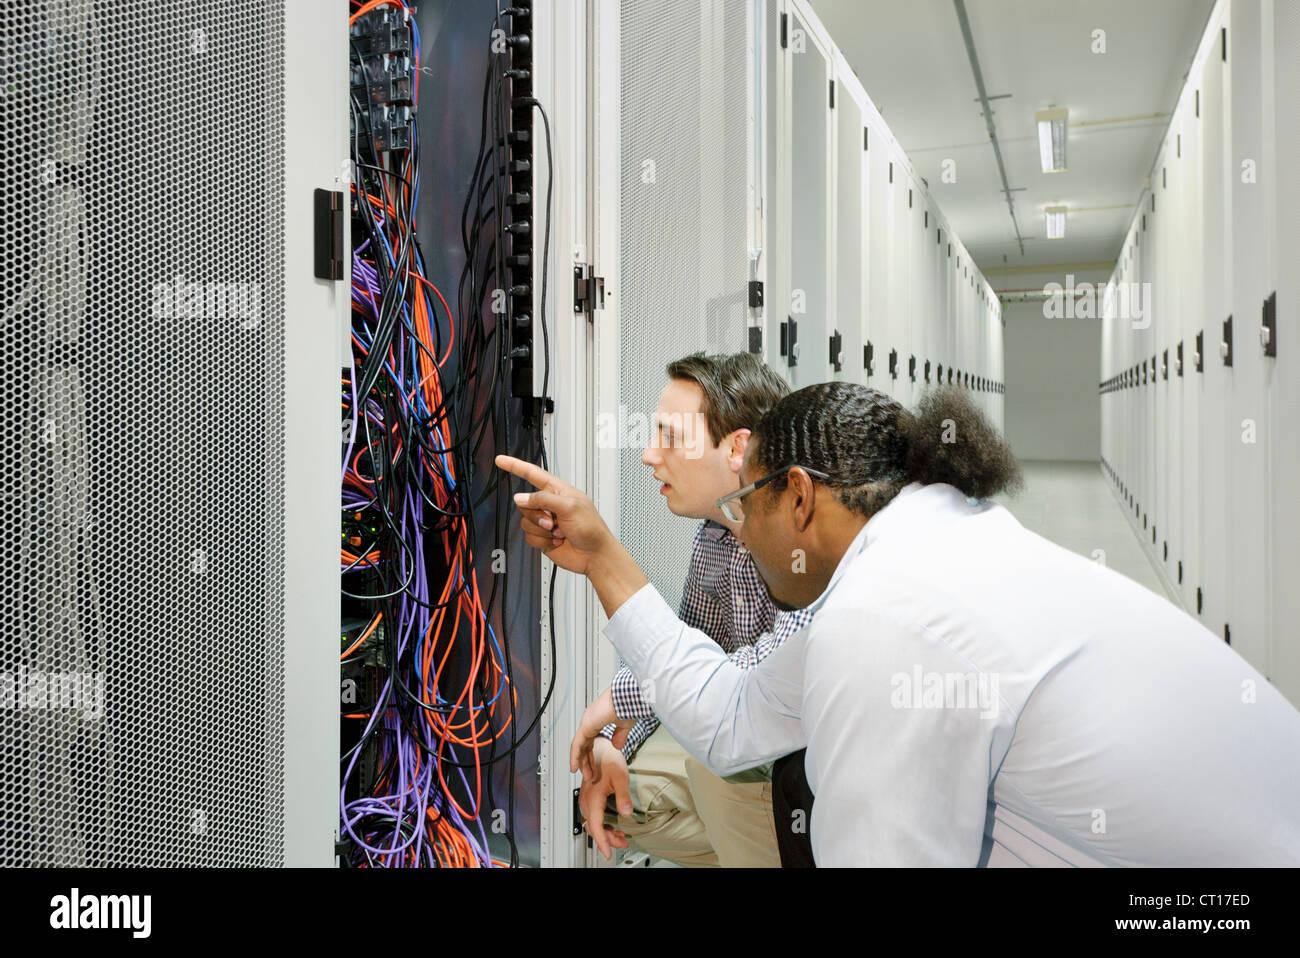 Hommes d'examiner les fils dans server Banque D'Images